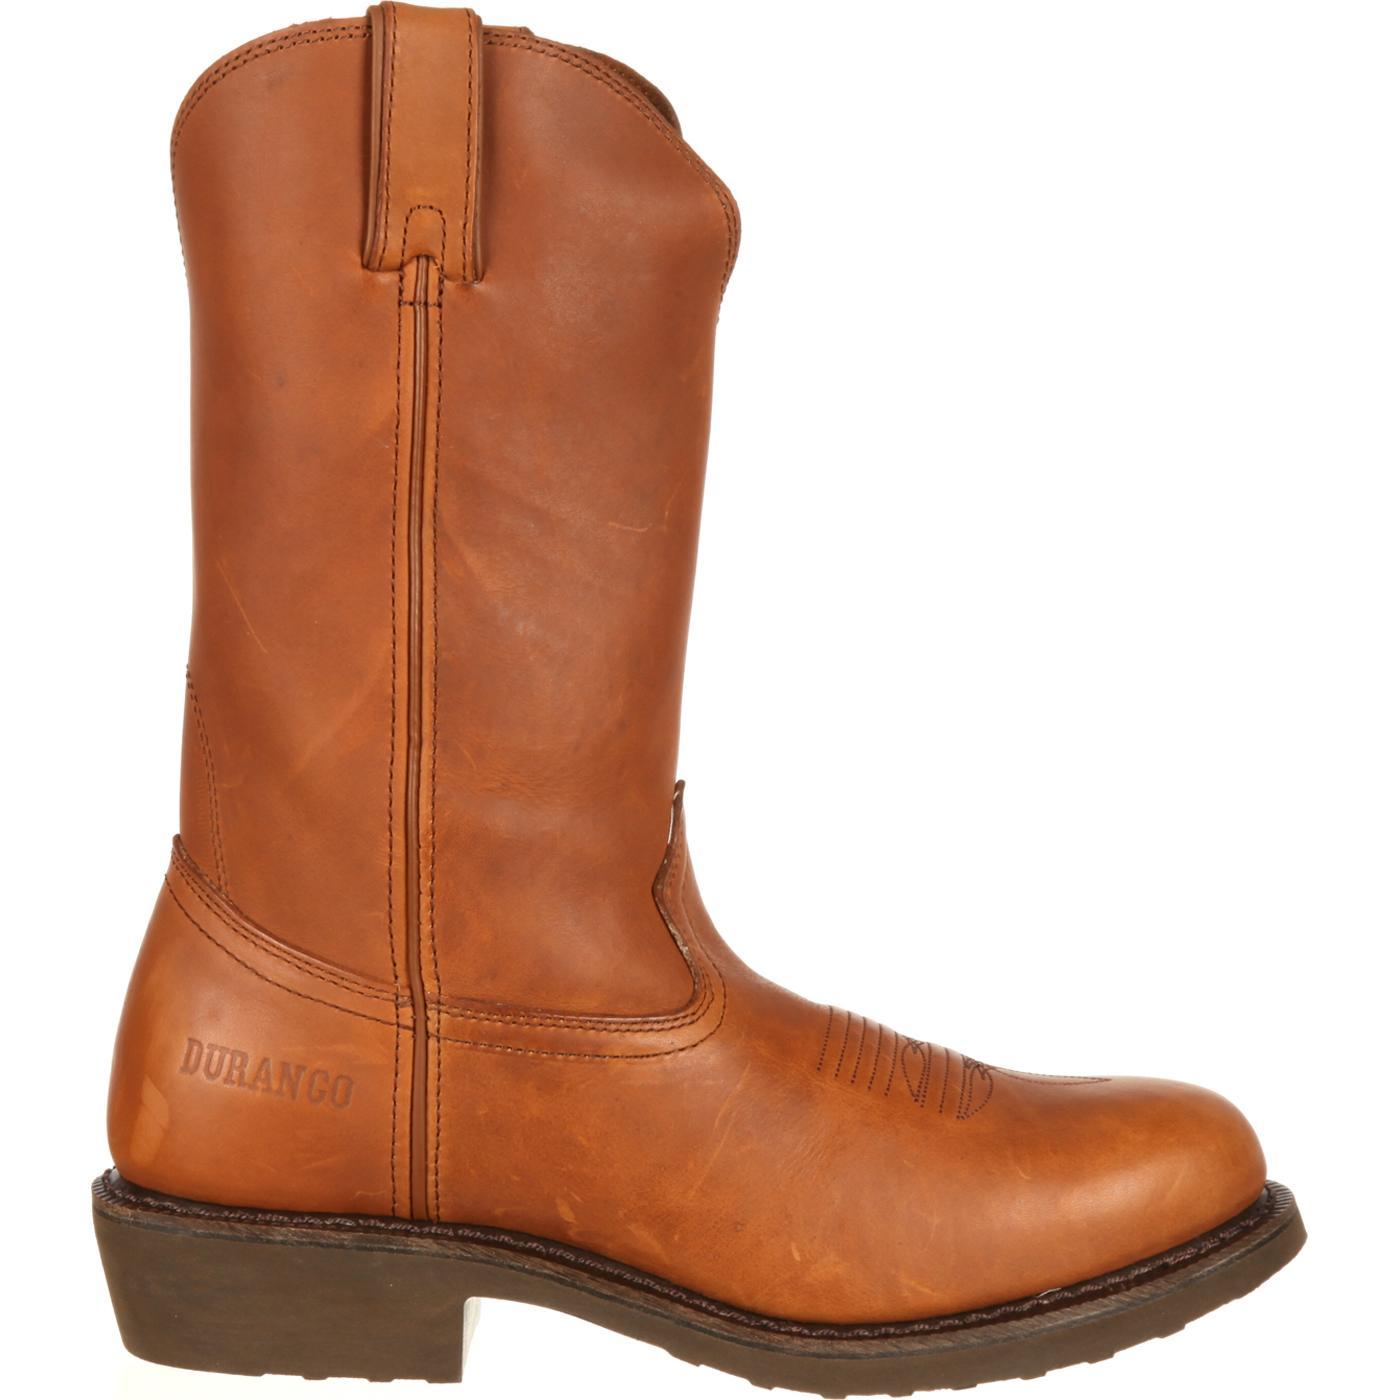 80ea505b831 Durango Farm 'N' Ranch Pull-On Boot